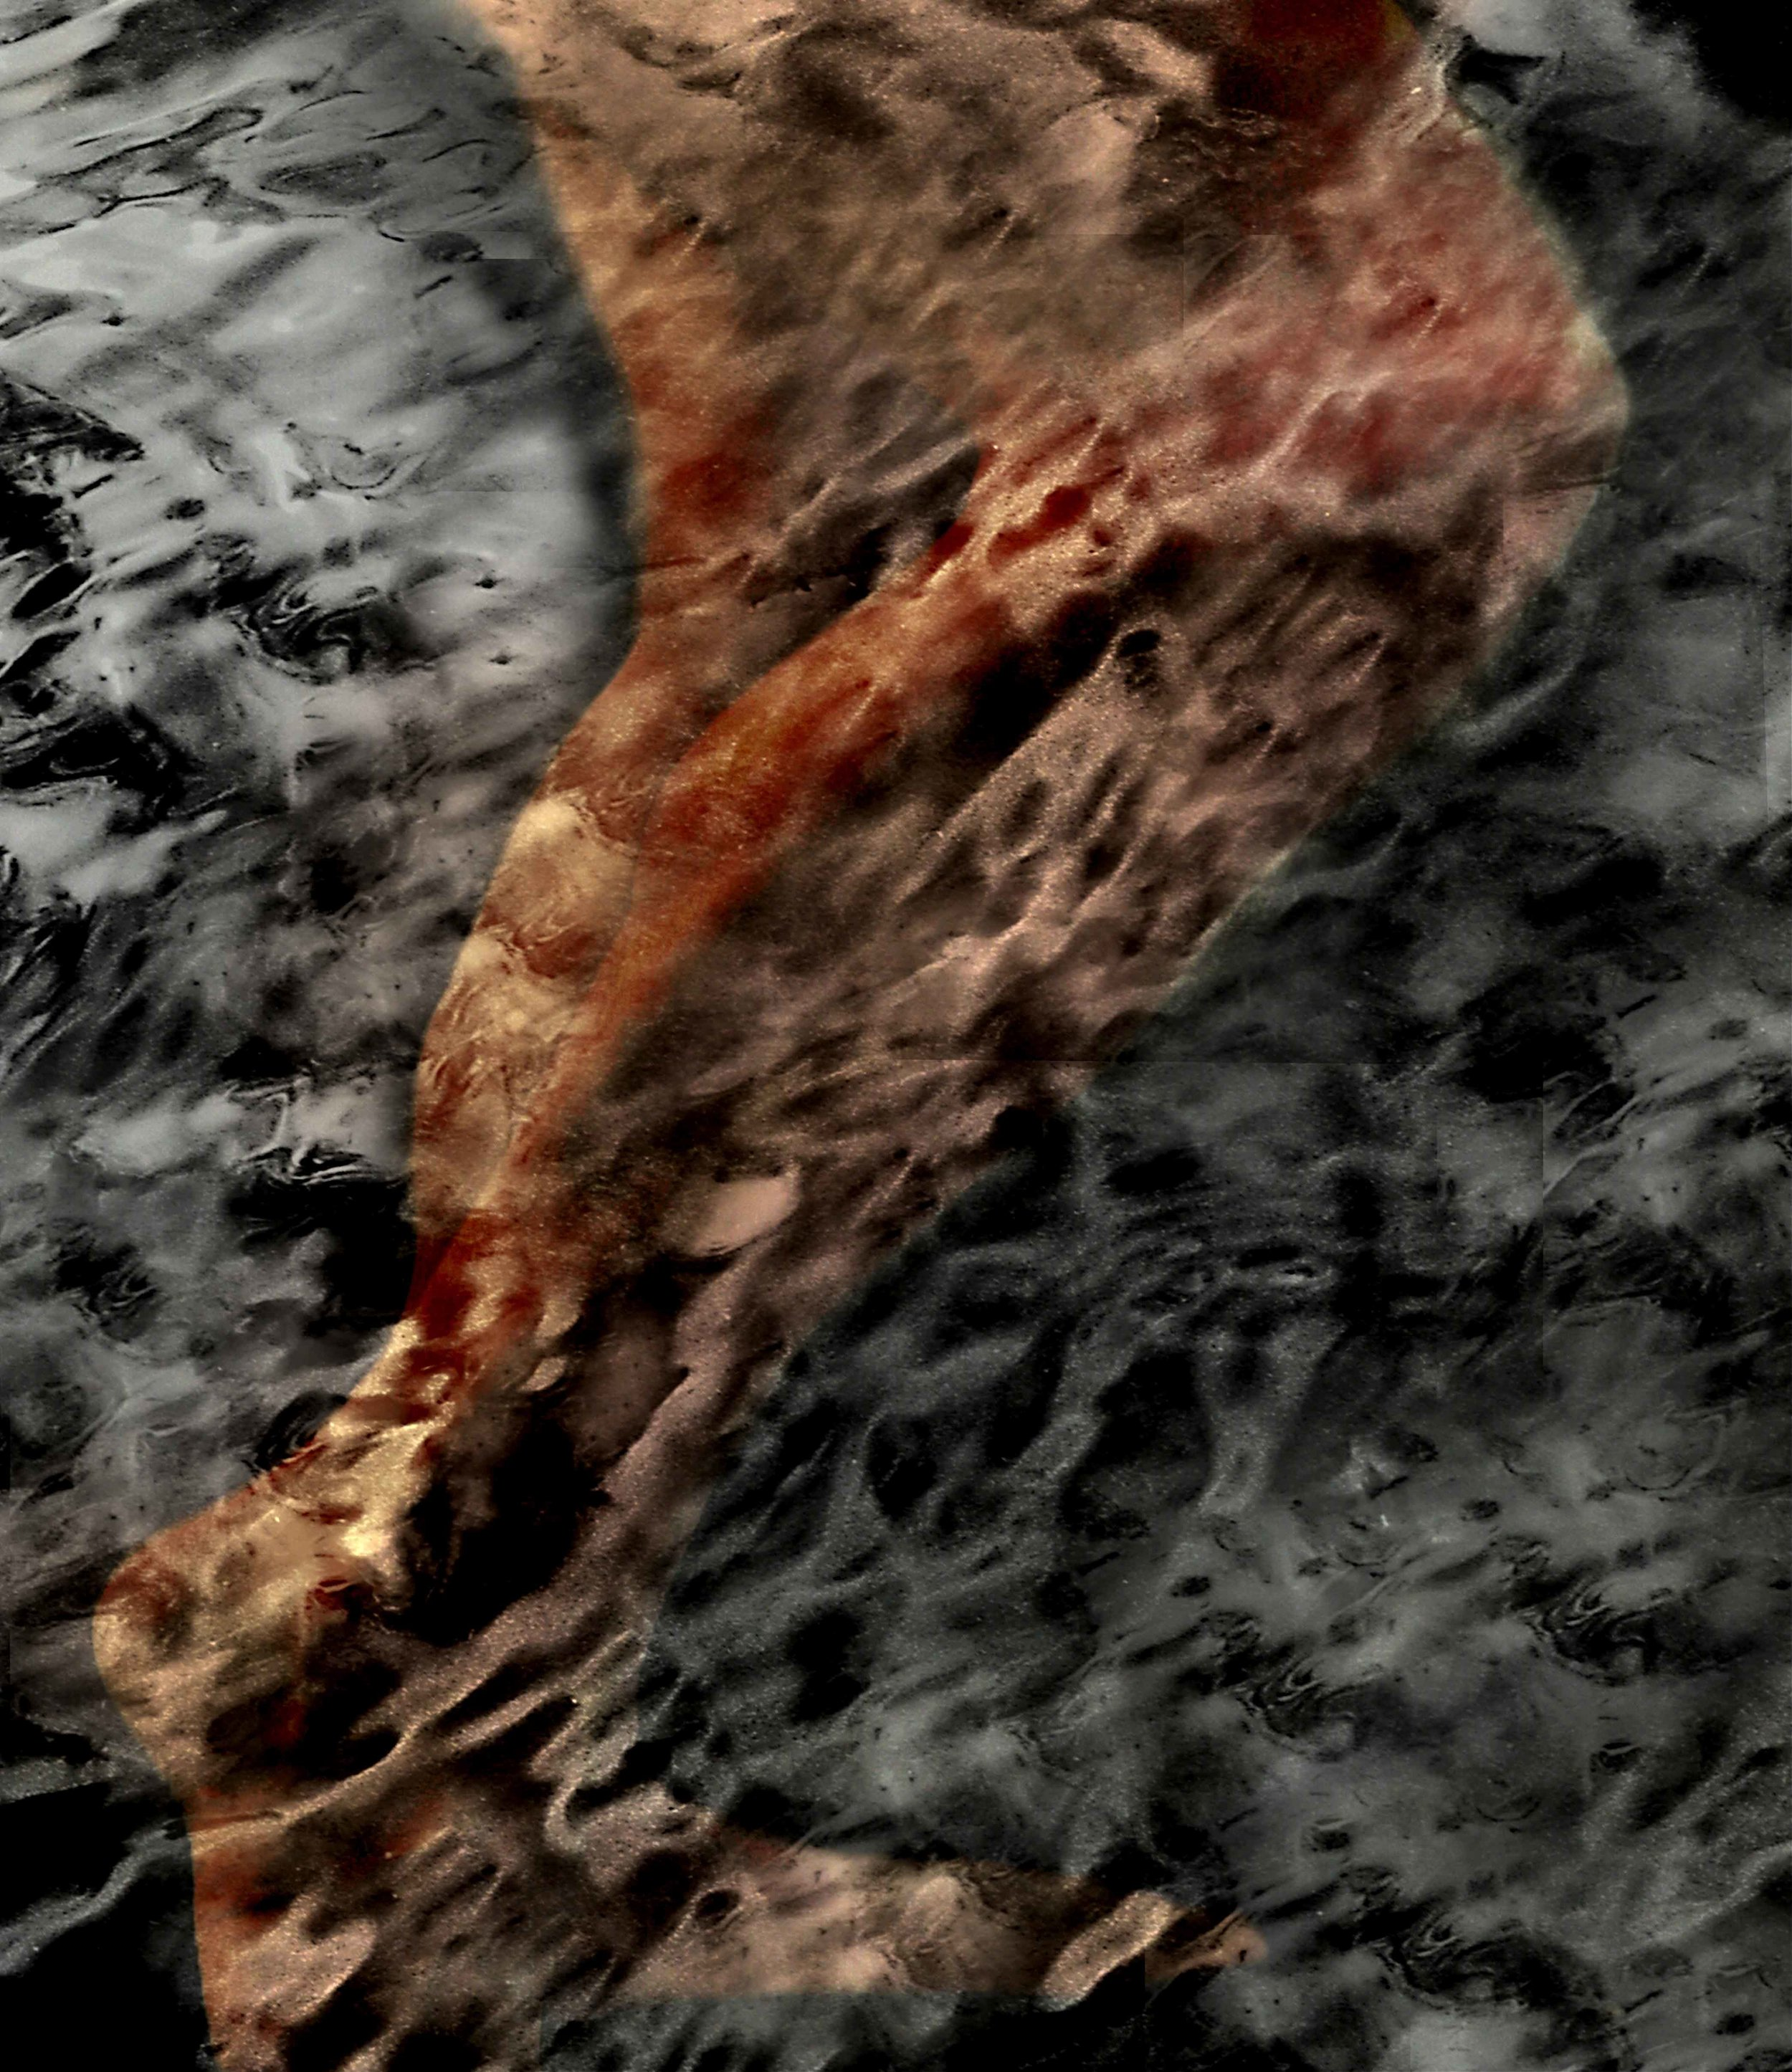 I Sing the Body #2, 2006.jpg